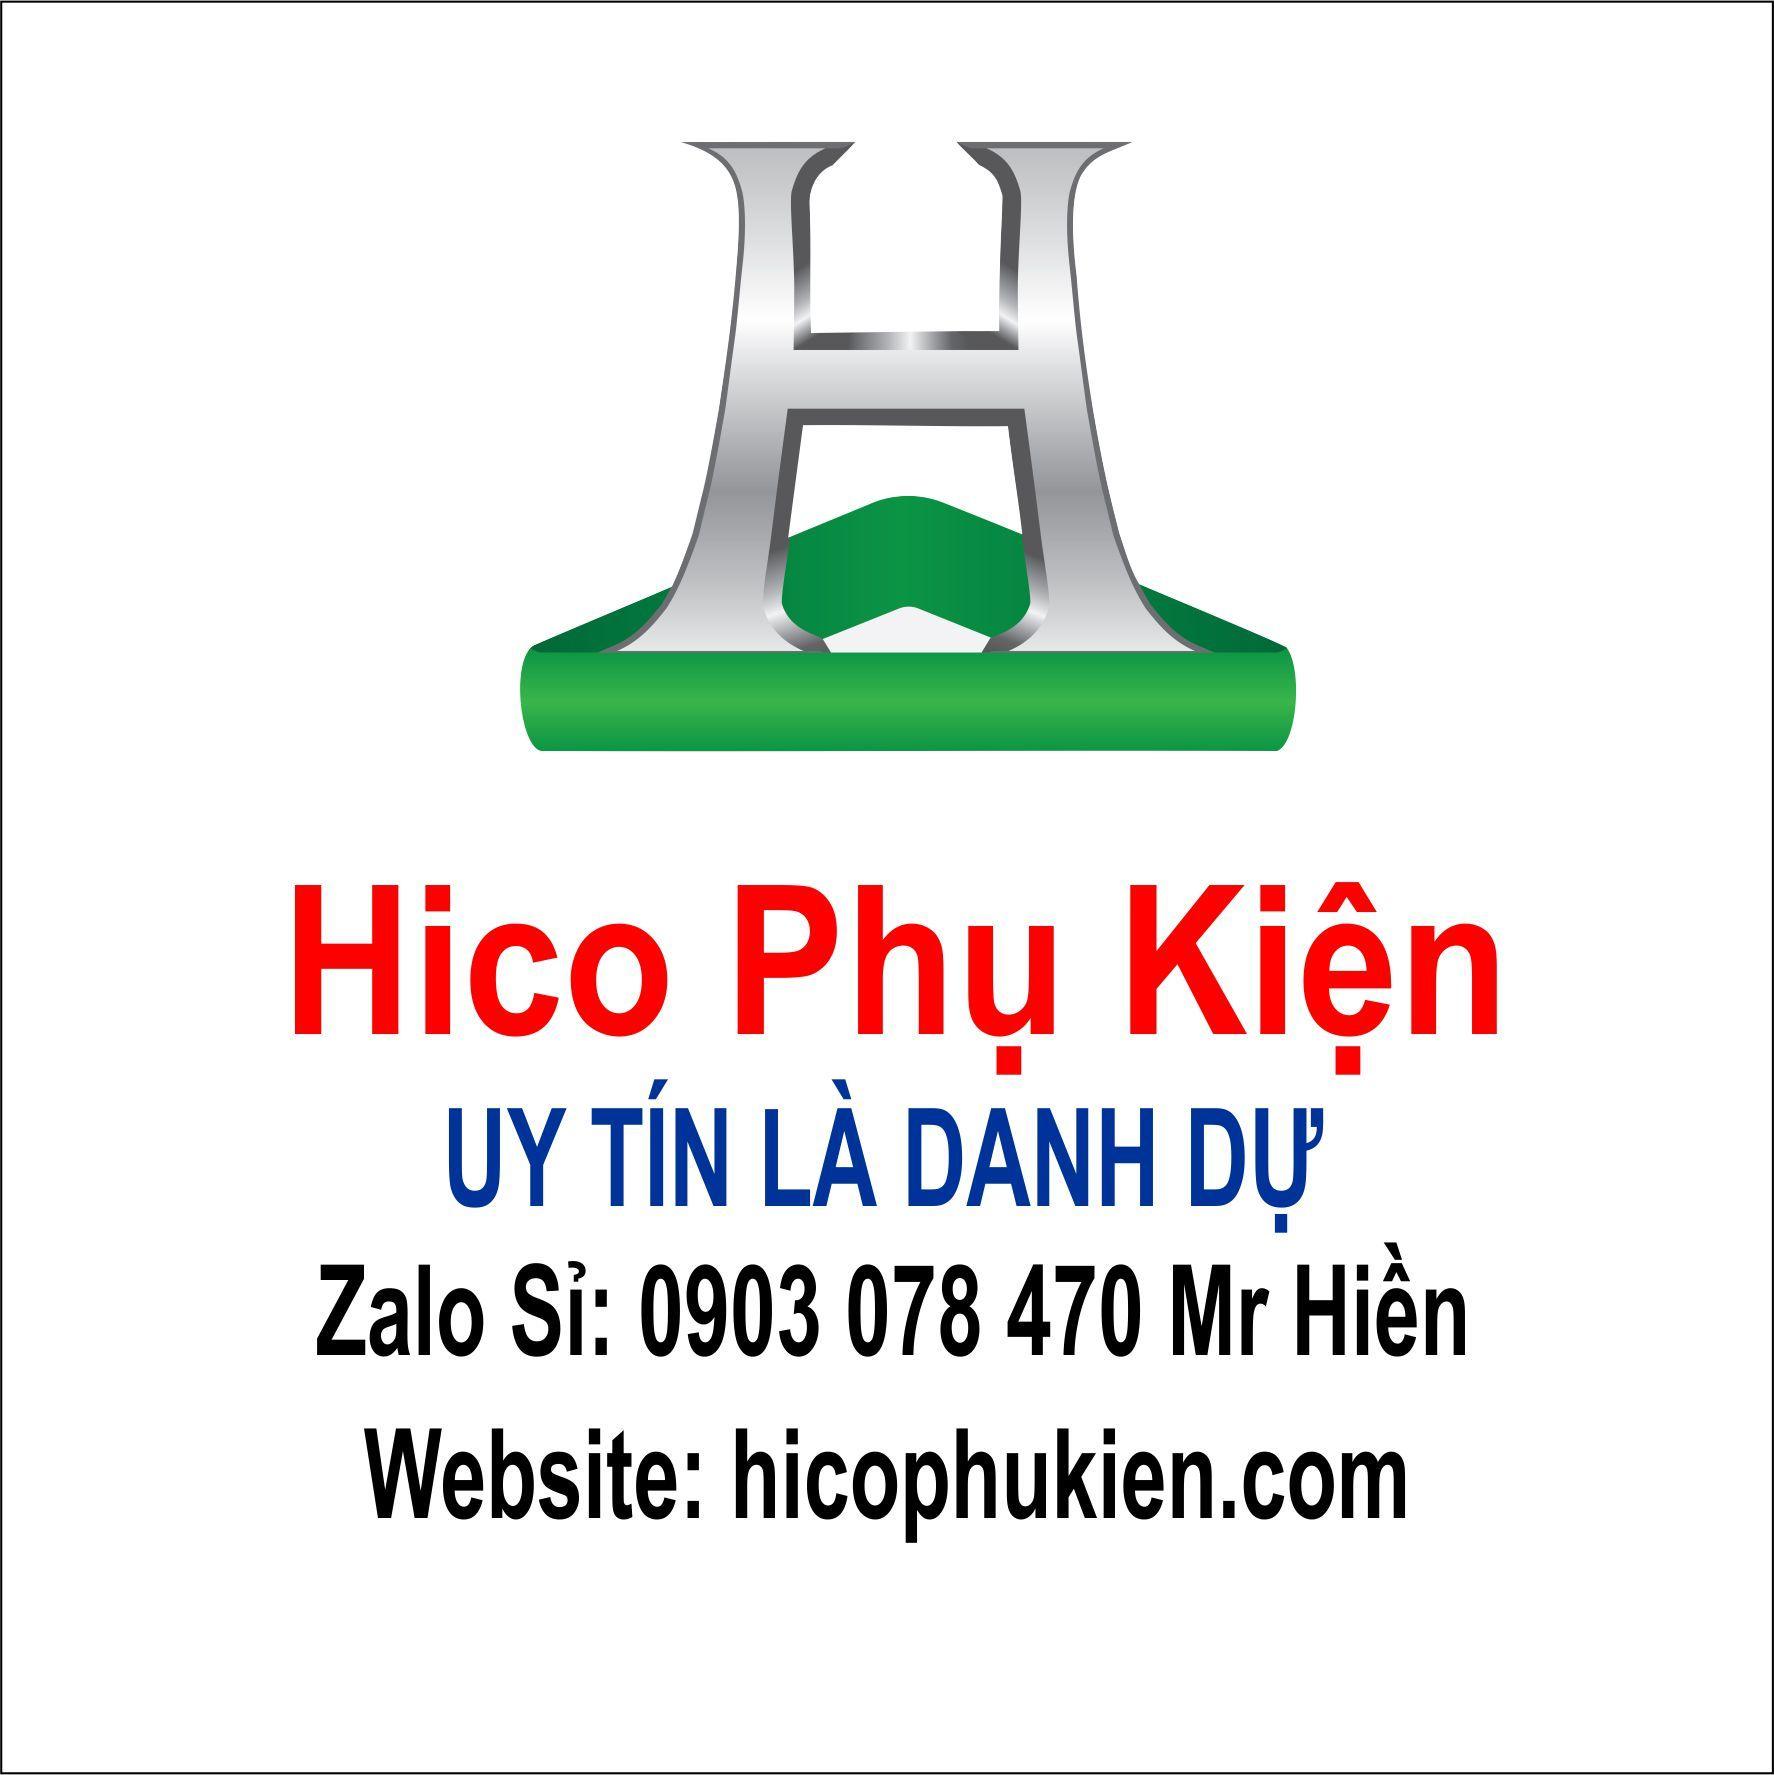 Hico Phụ Kiện